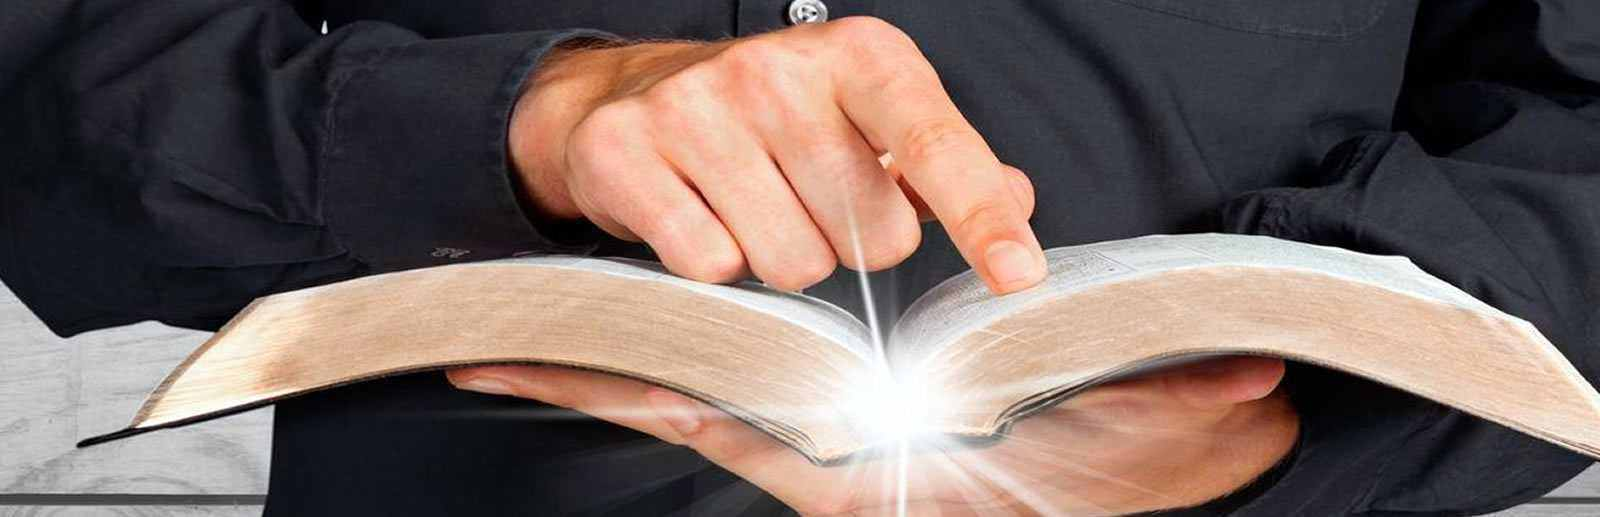 1  God speaks through His Word  :  Pastor Benny Hinn, Devotional